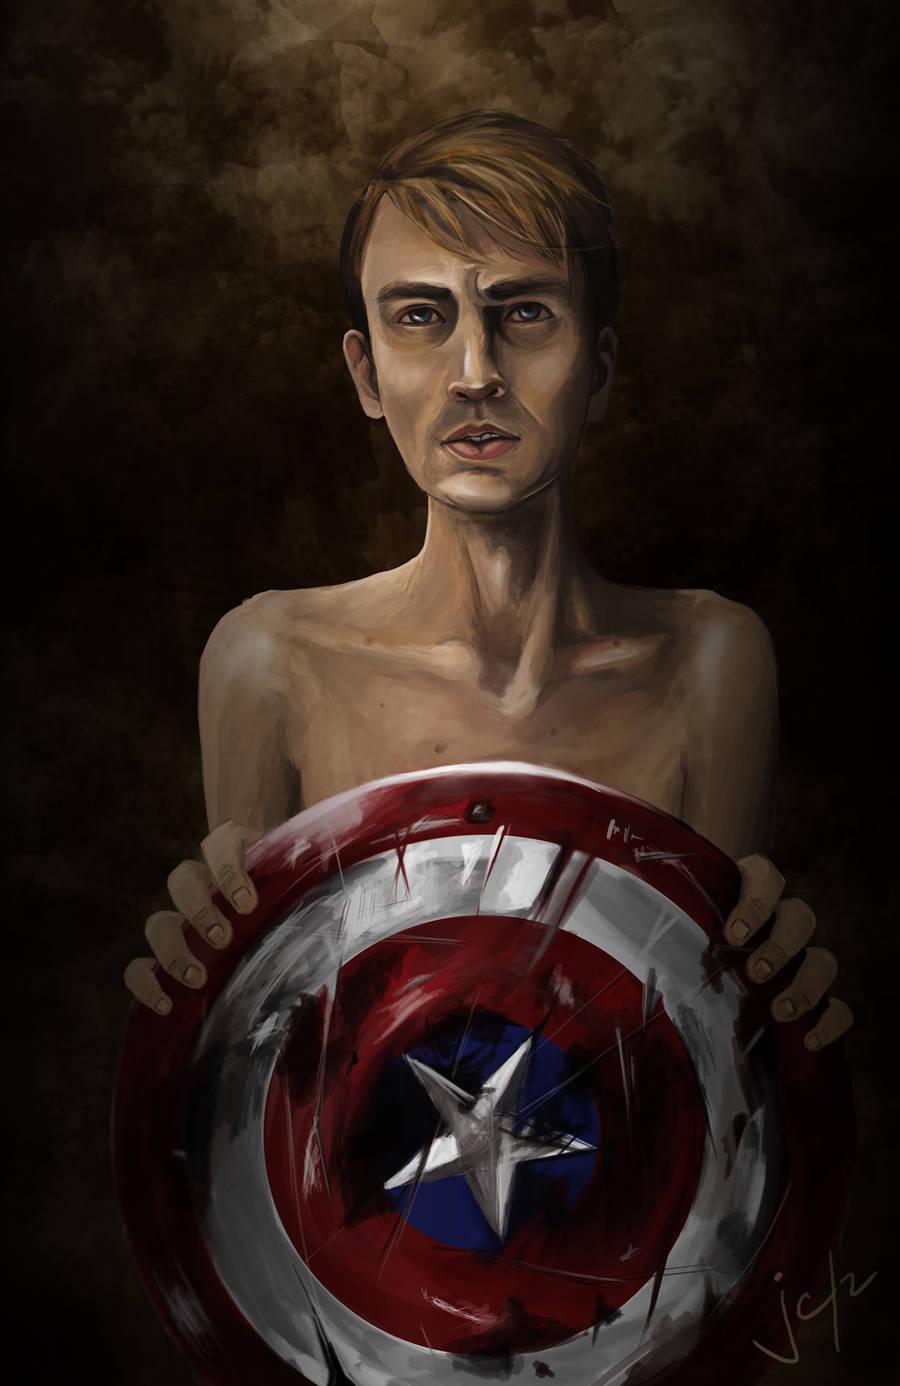 Steve Rogers, aka Captain America by jcsison